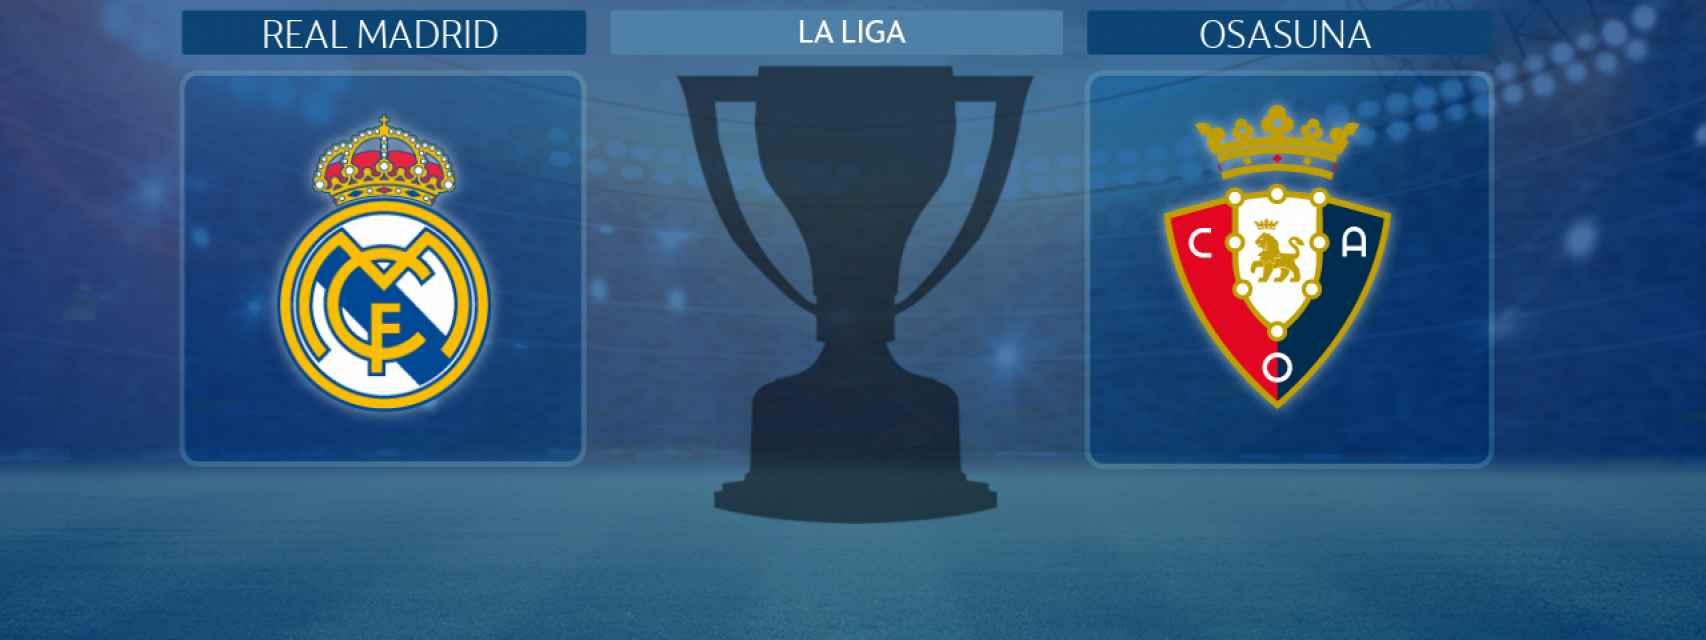 Real Madrid - Osasuna, partido de La Liga